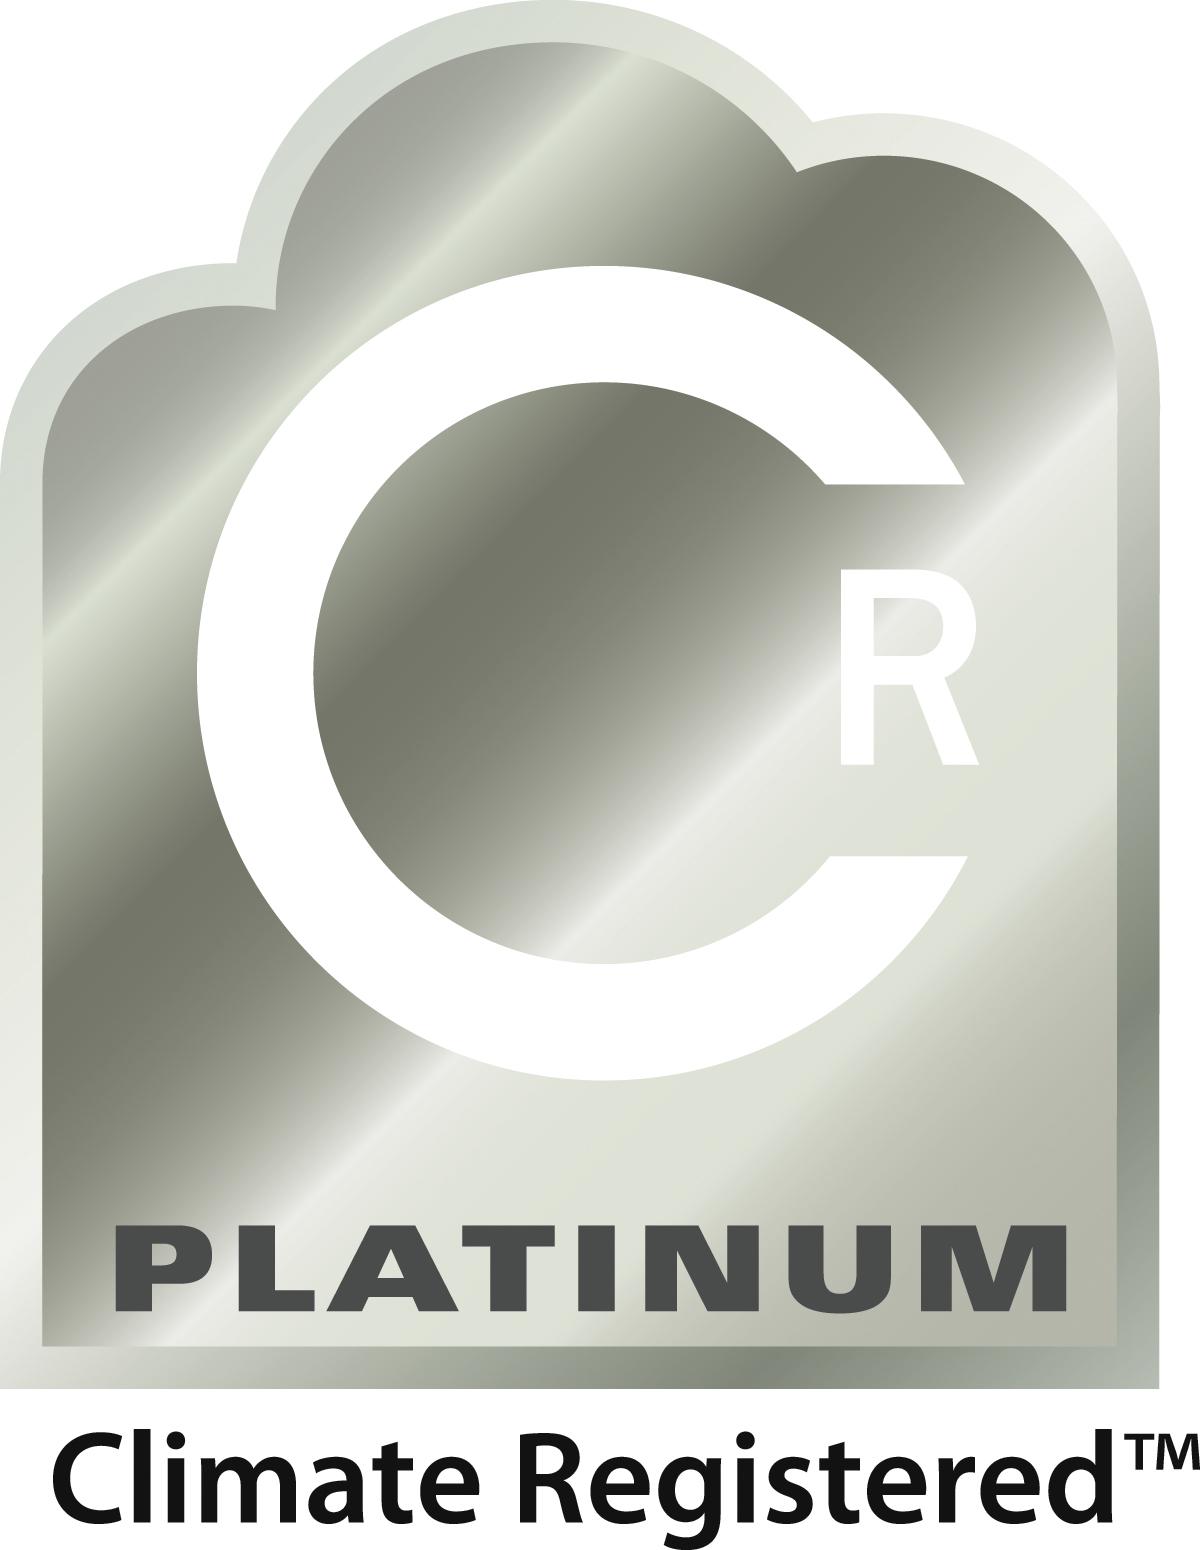 Climate Registered Platinum Award